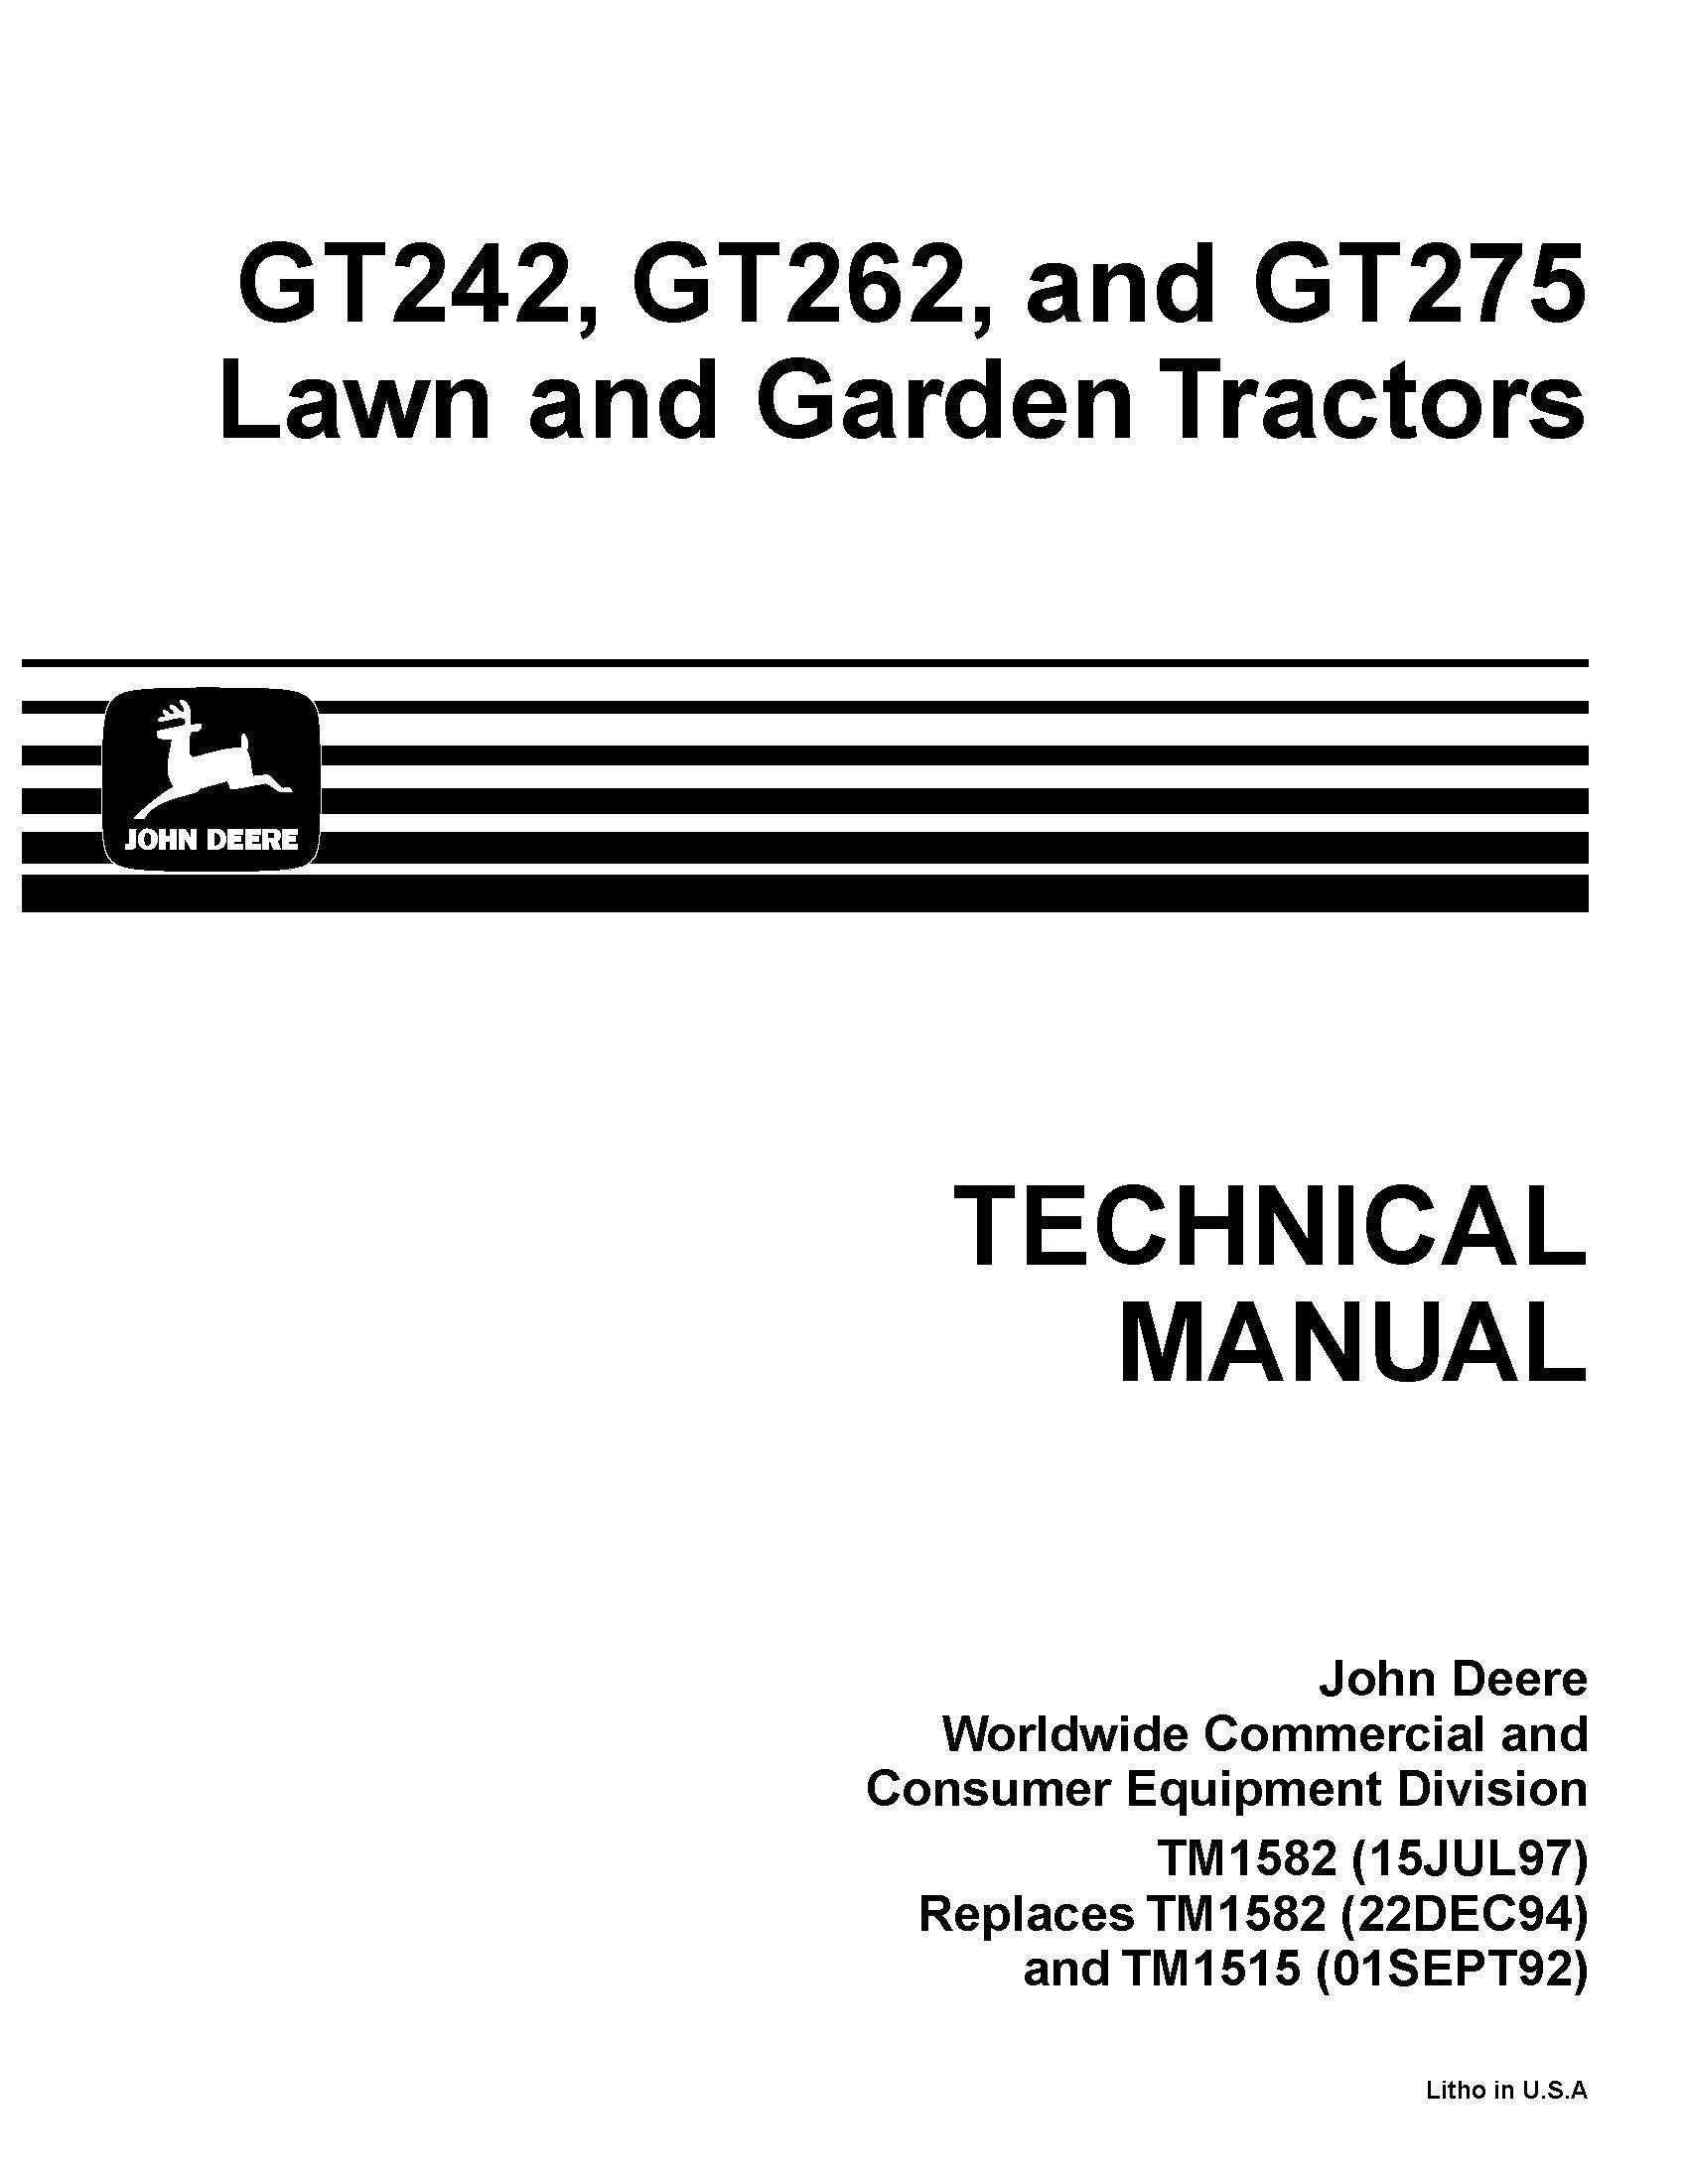 john deere gt242 gt262 gt275 lawn garden tractor technical service manual: john  deere: amazon.com: books  amazon.com